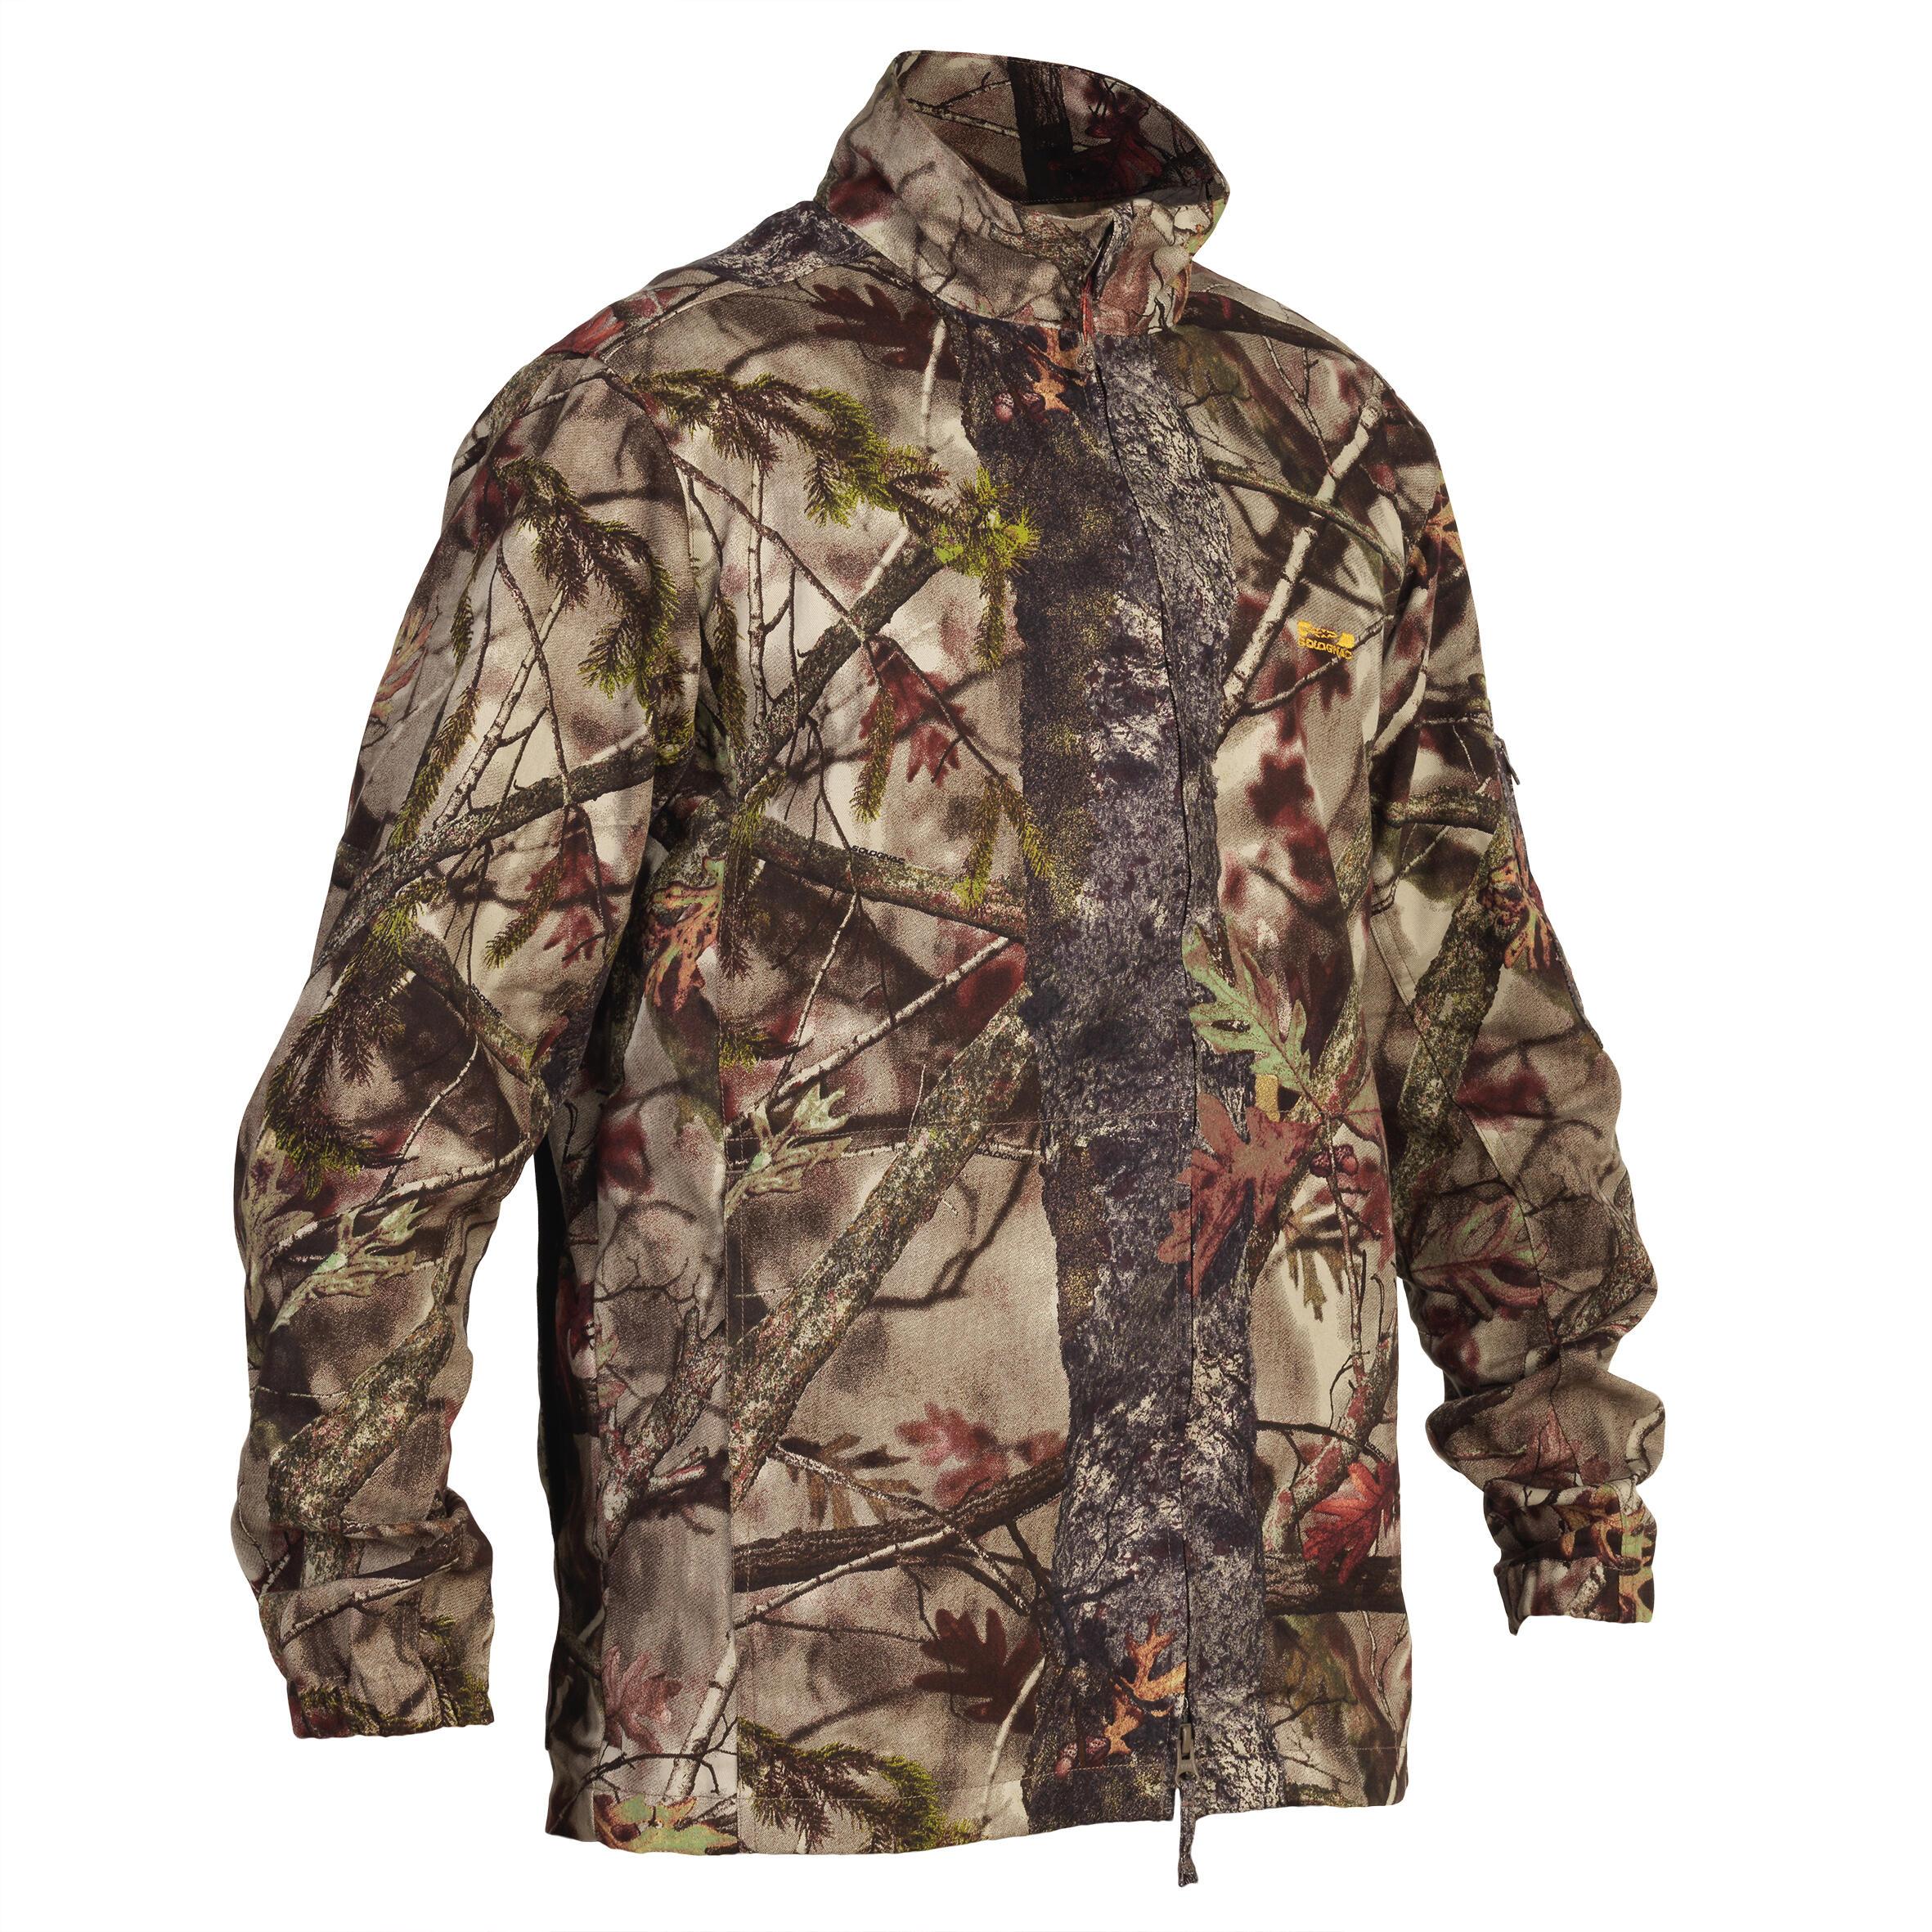 Actikam 100 camouflage jacket brown